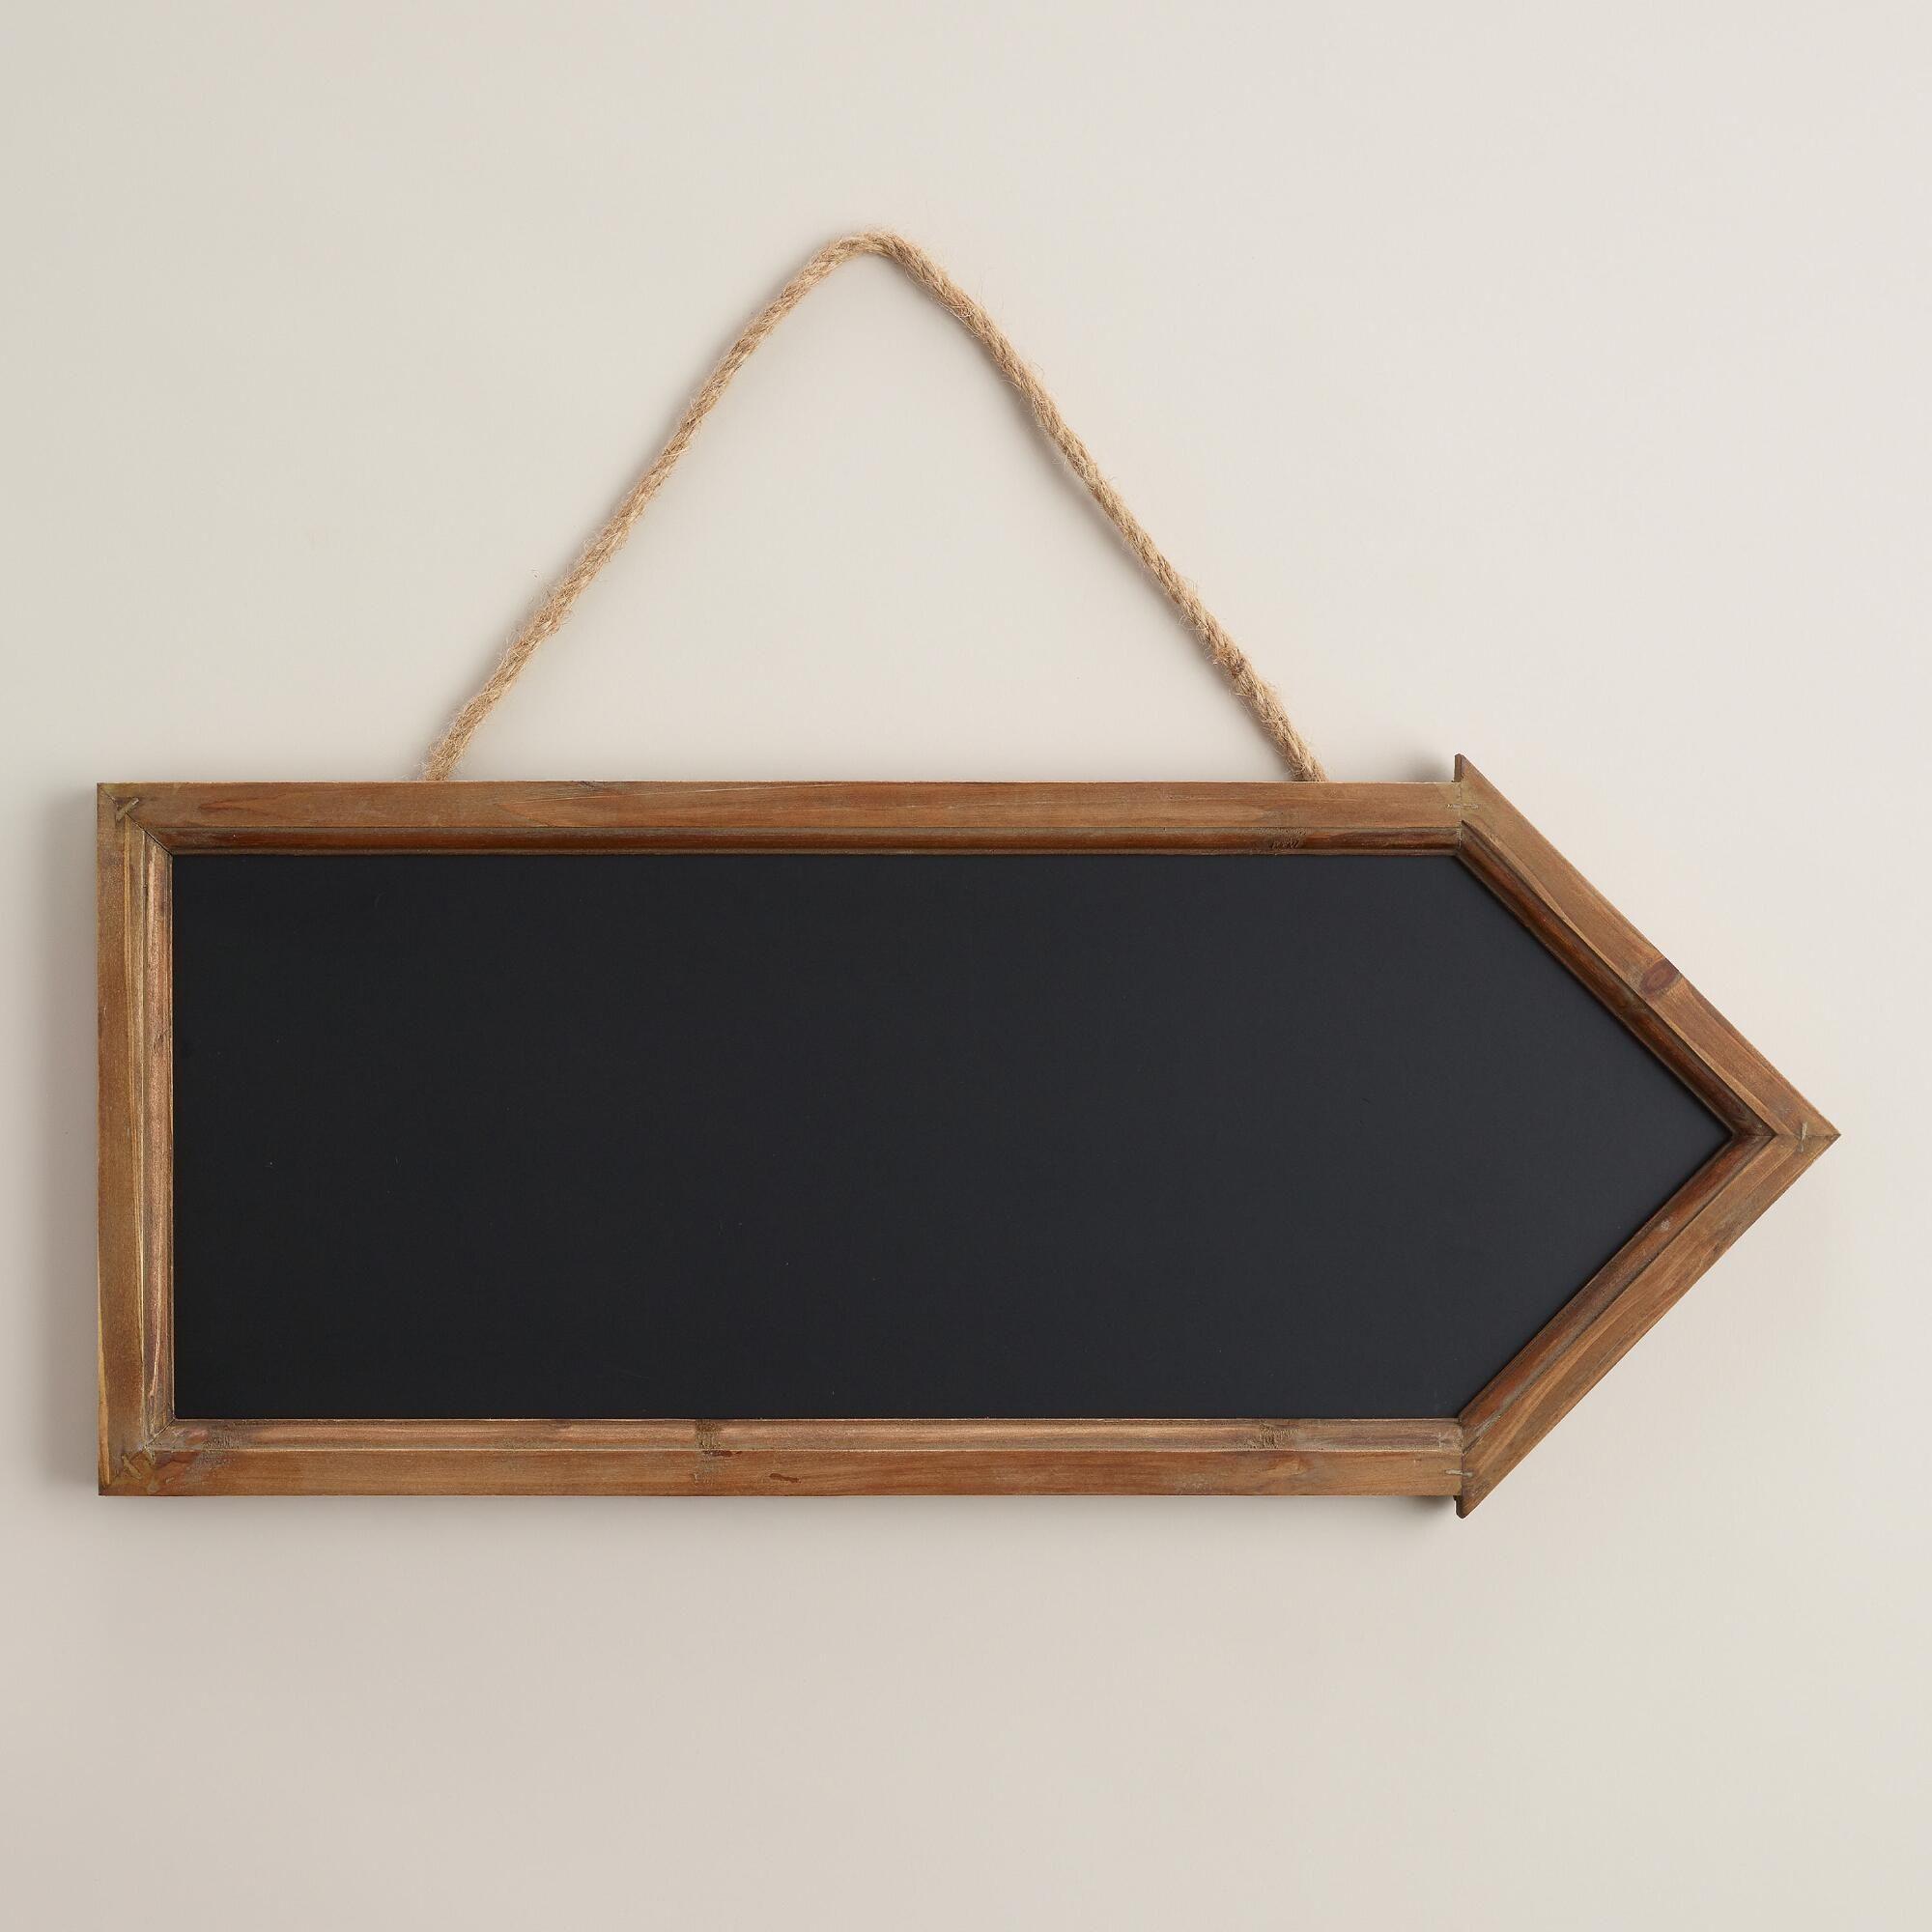 natural wood arrow chalkboard - Wood Framed Chalkboard